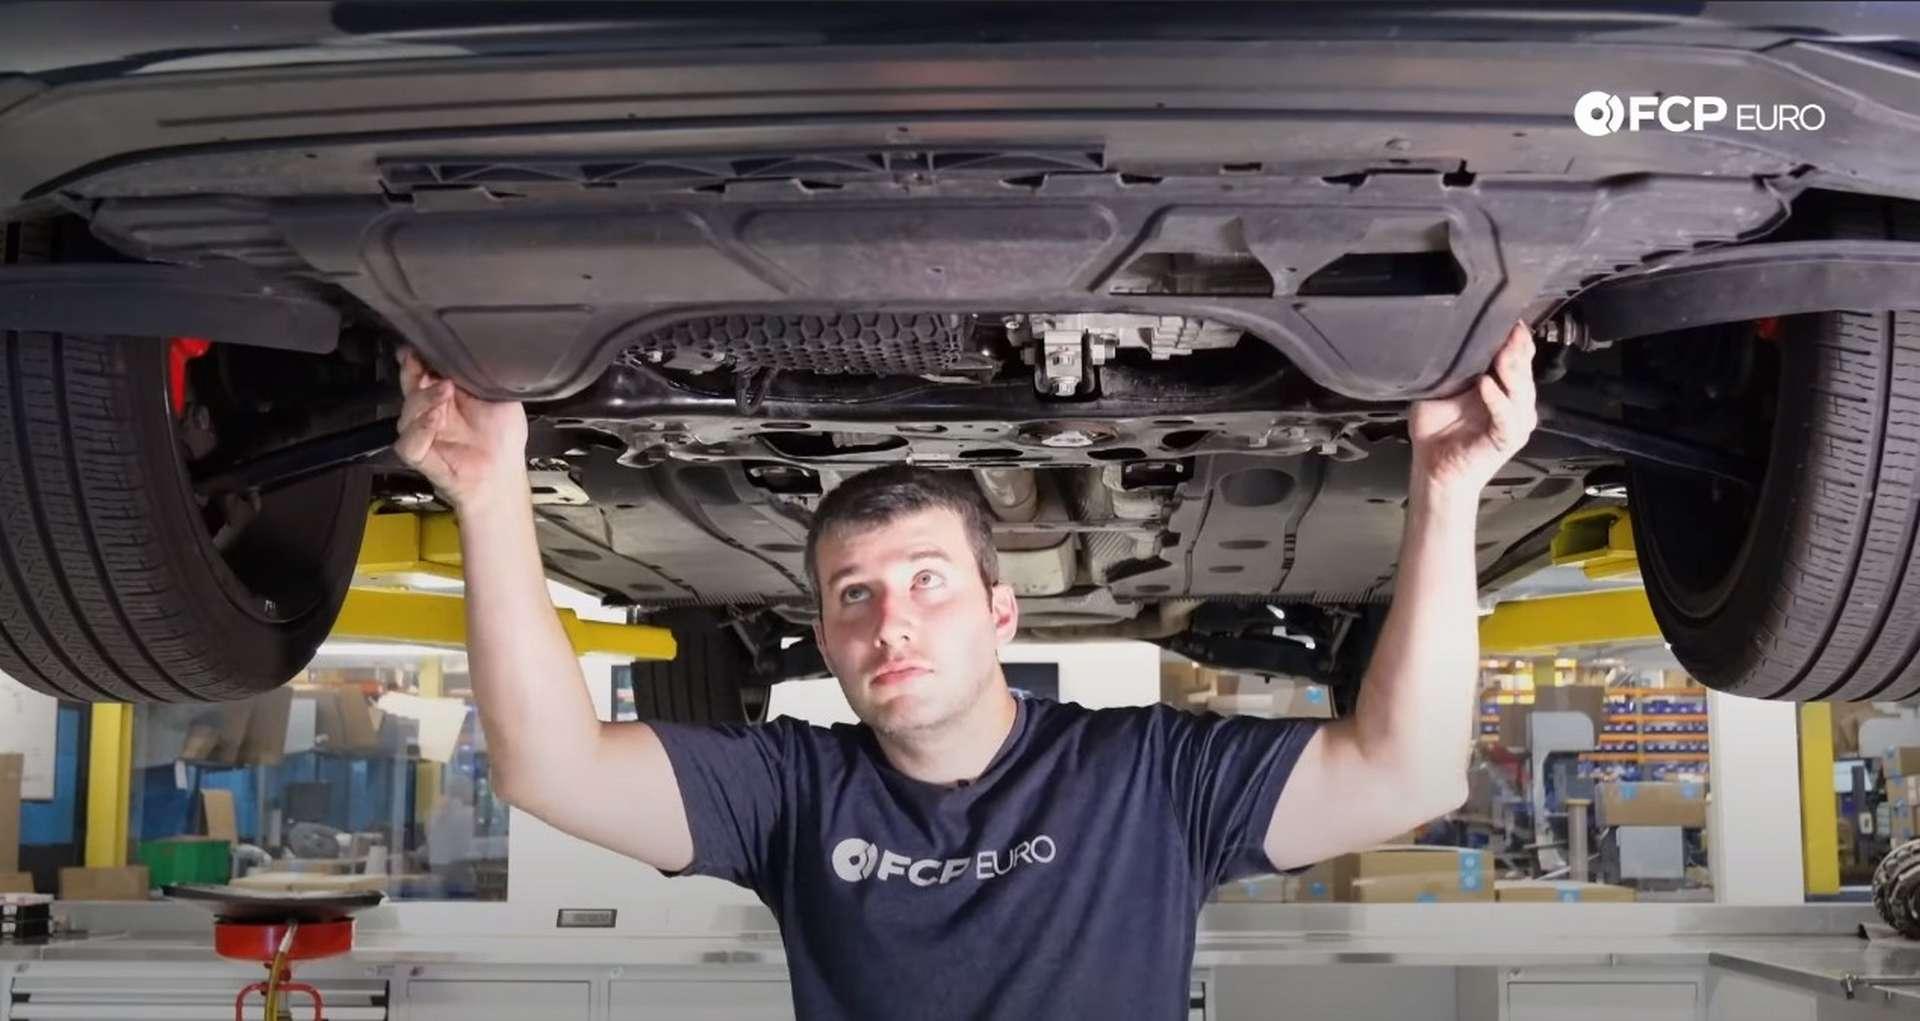 75-DIY_VW_GTI_Clutch-Job-Fittin-Belly-Pan